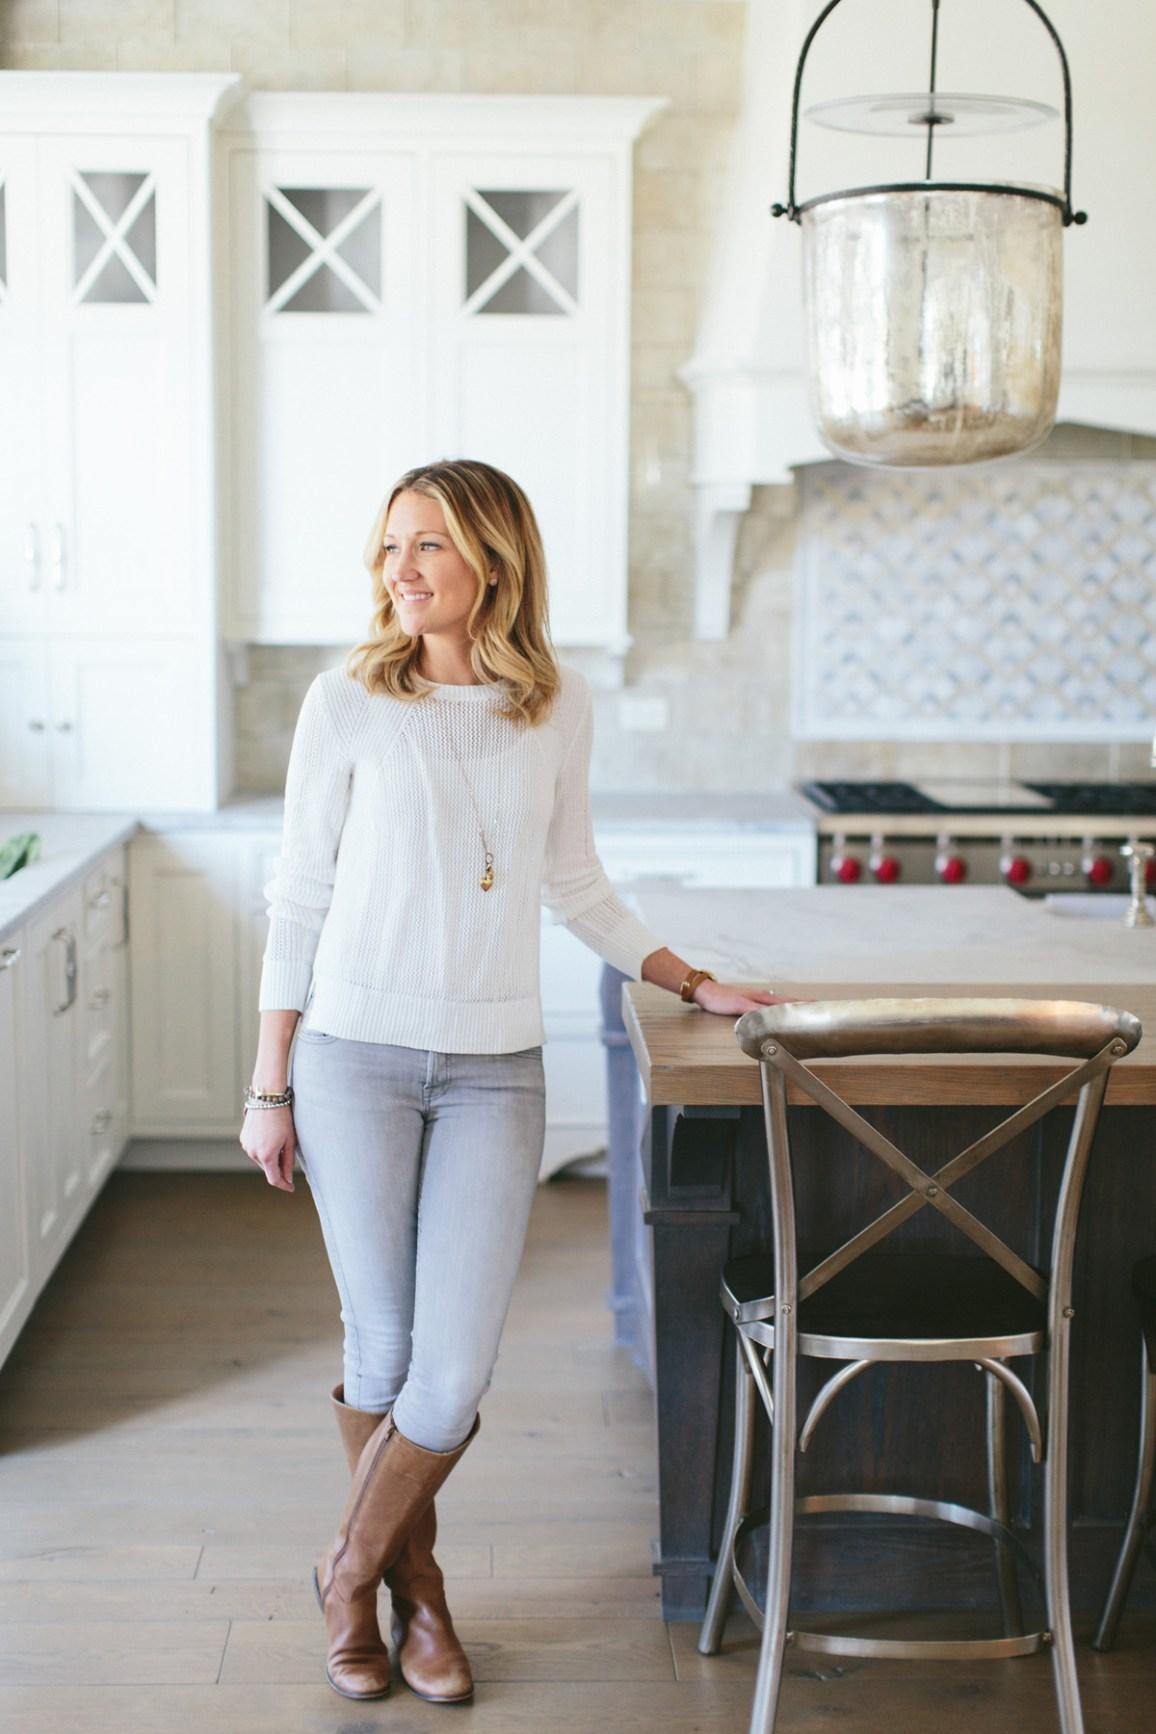 Kate Marker Shares Her Insta Faves For Interior Design Inspiration 365barrington